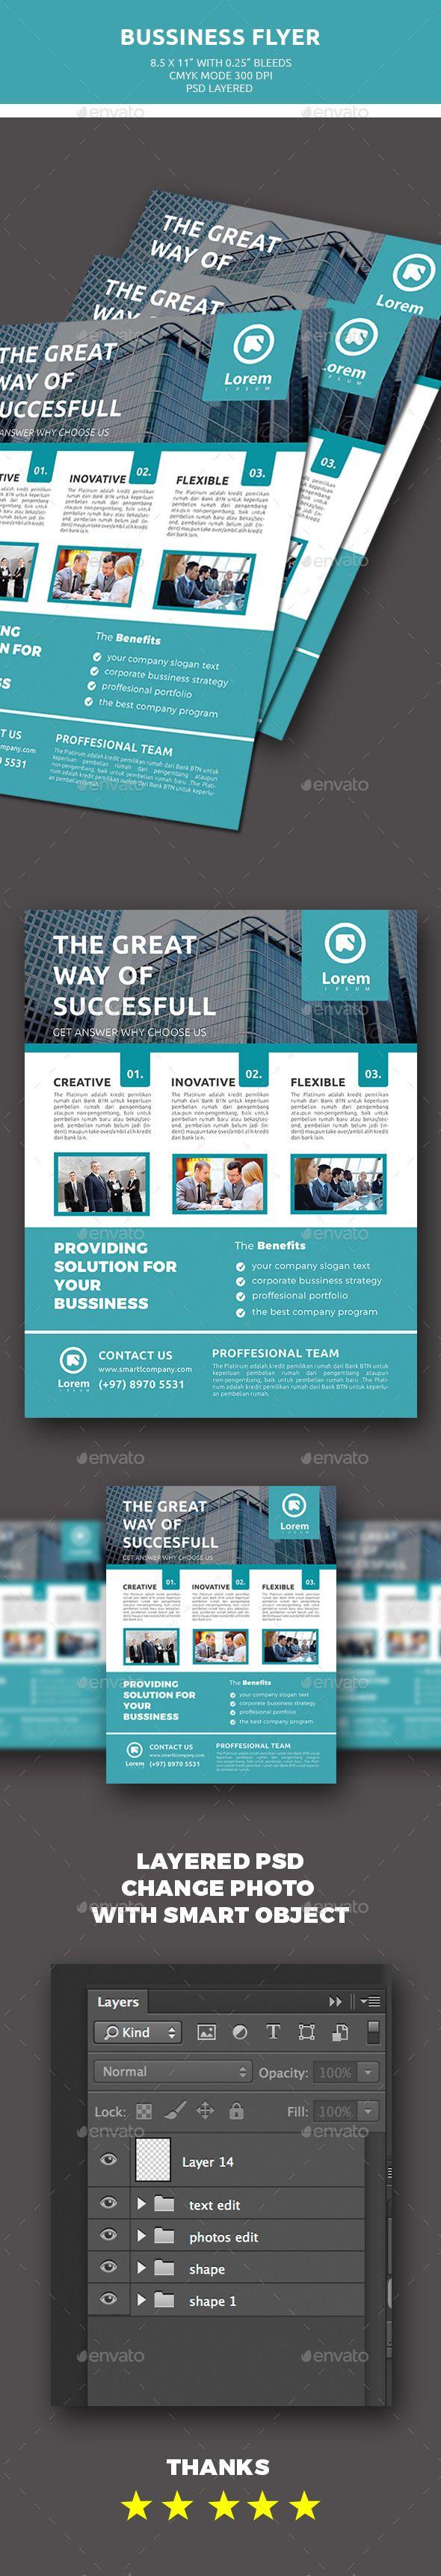 Best 30 Law Firm Brochure Design ideas on Pinterest   Brochure ...